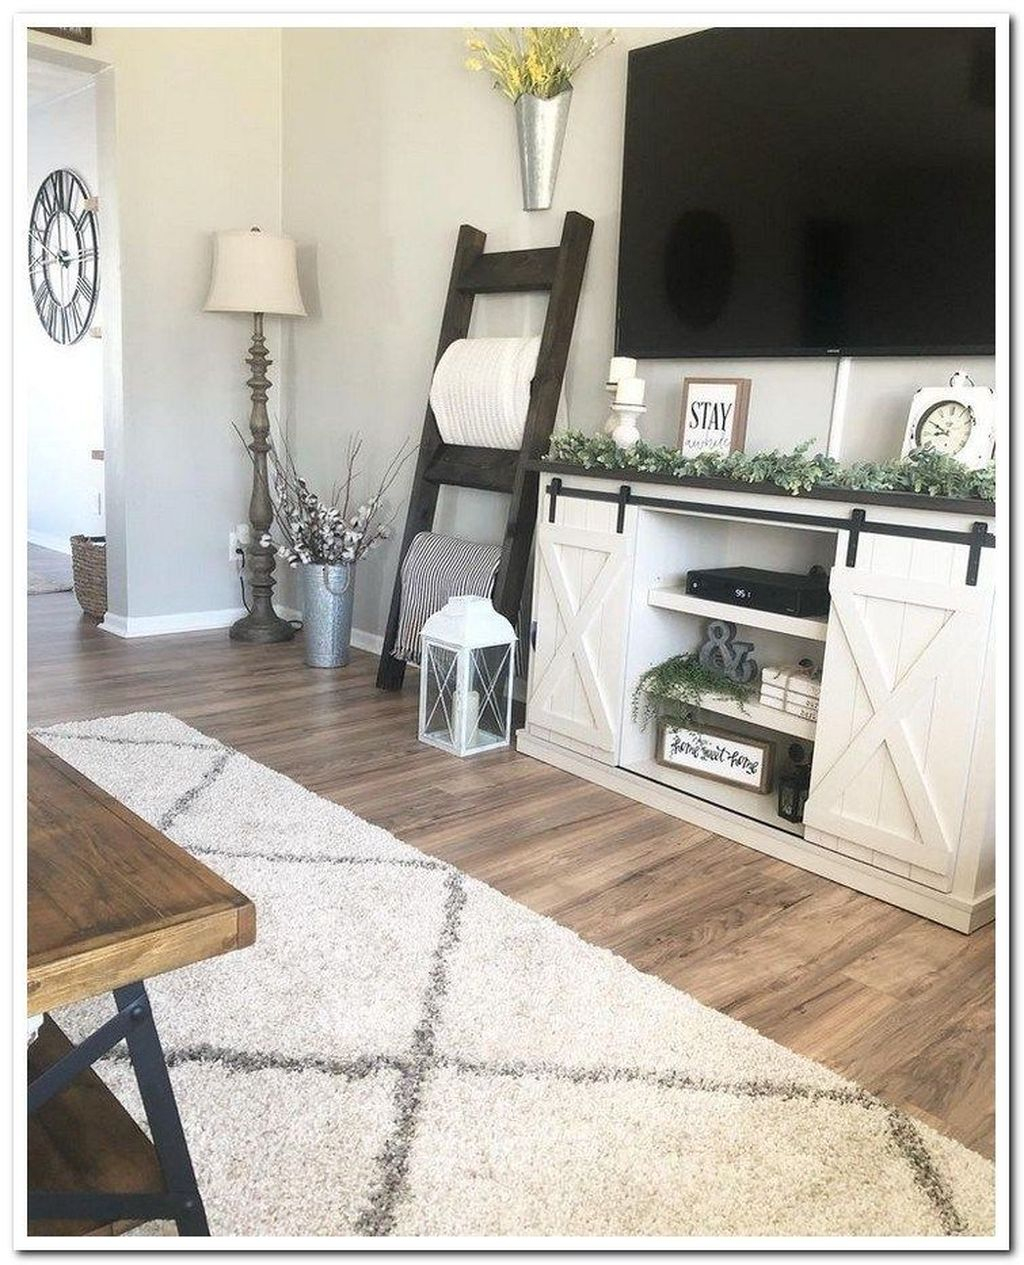 Catchy Farmhouse Apartment Interior Design Ideas To Try Now 28